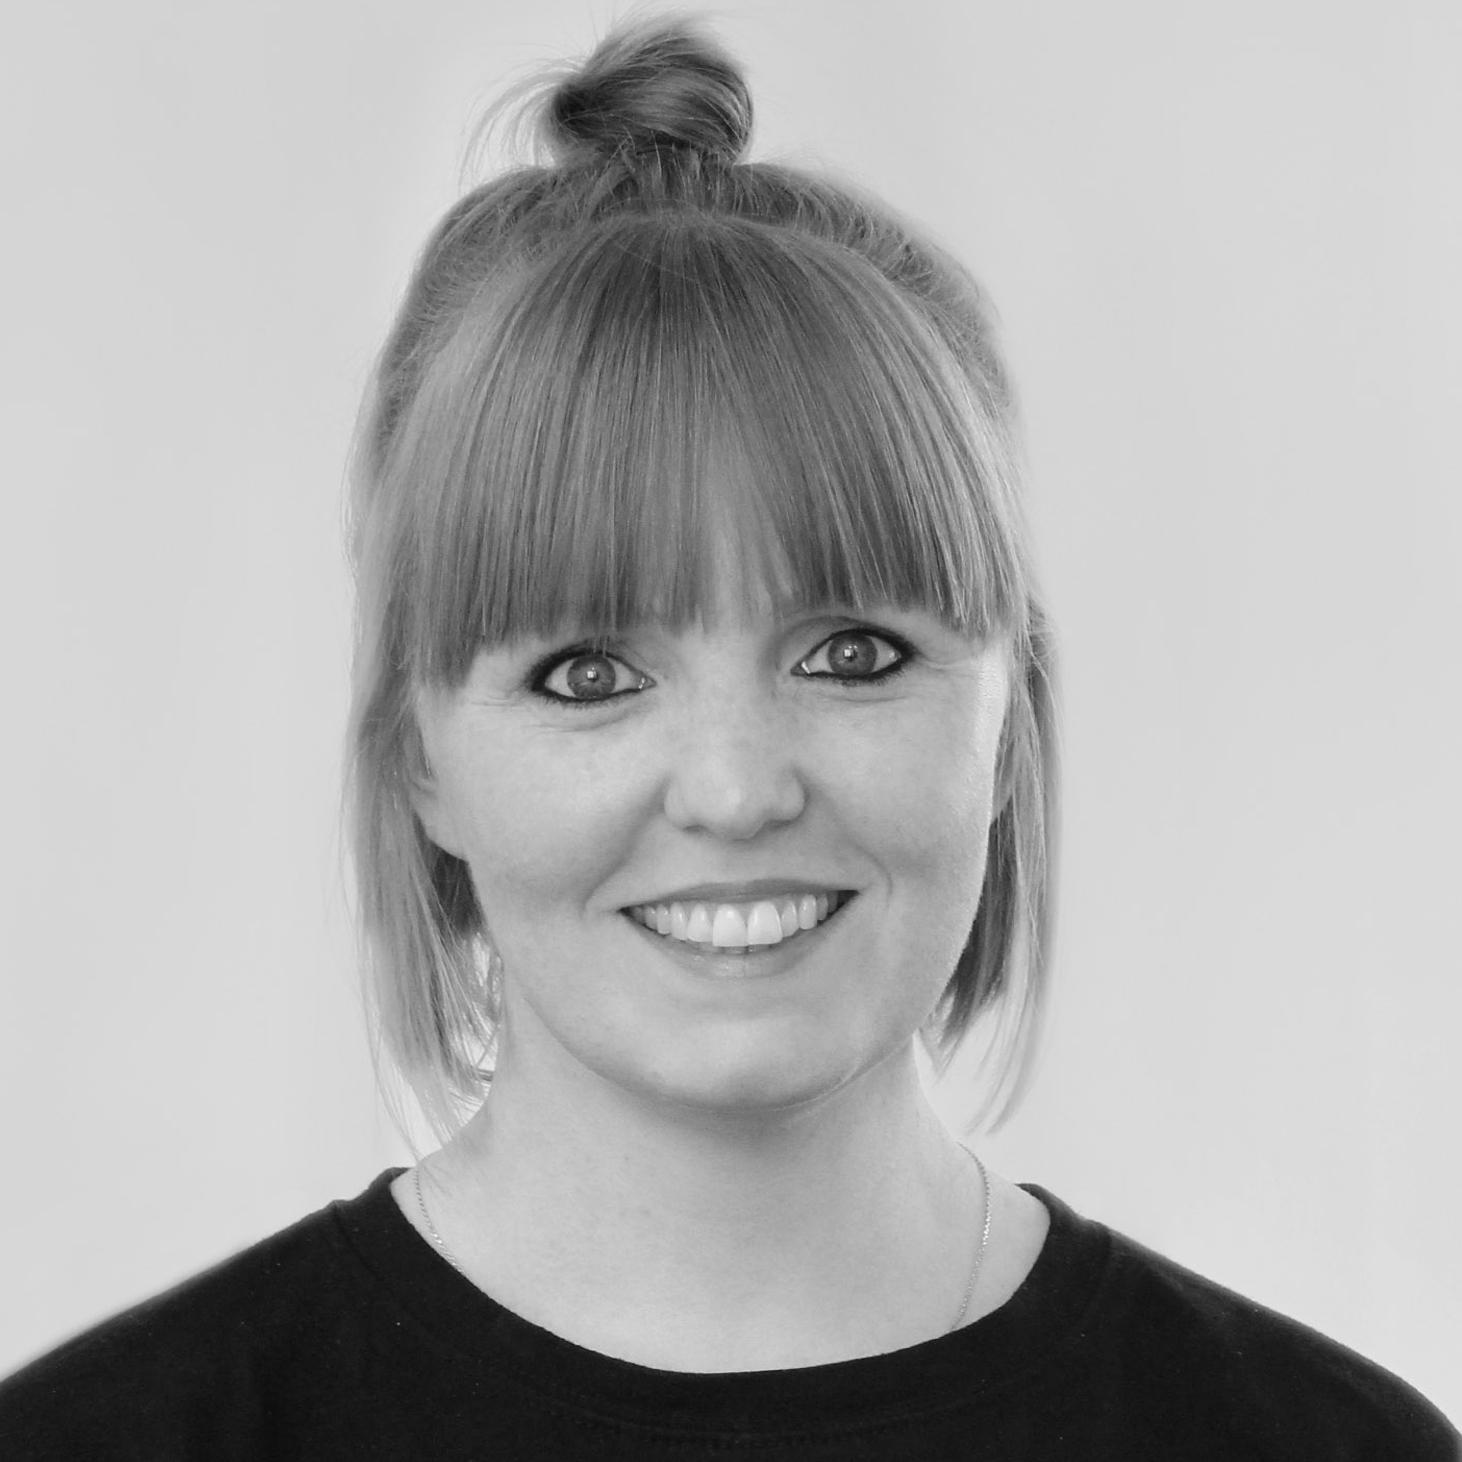 https://ksrarchitects.com/wp-content/uploads/2020/12/Michelle-Sweeney.jpg